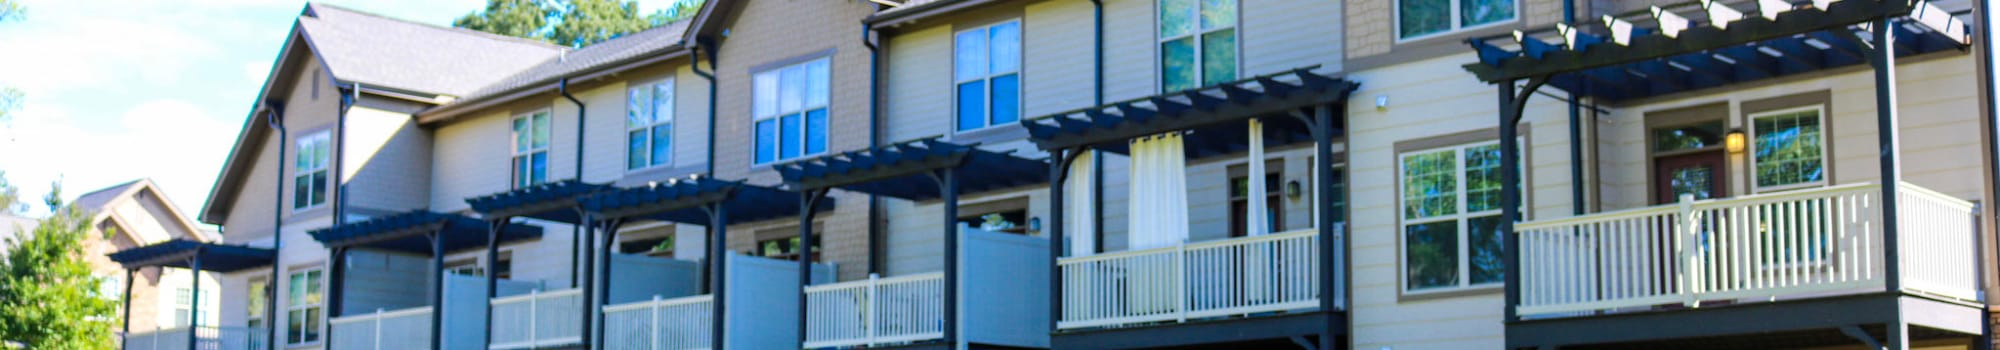 Apartments in Chapel Hill floor plans